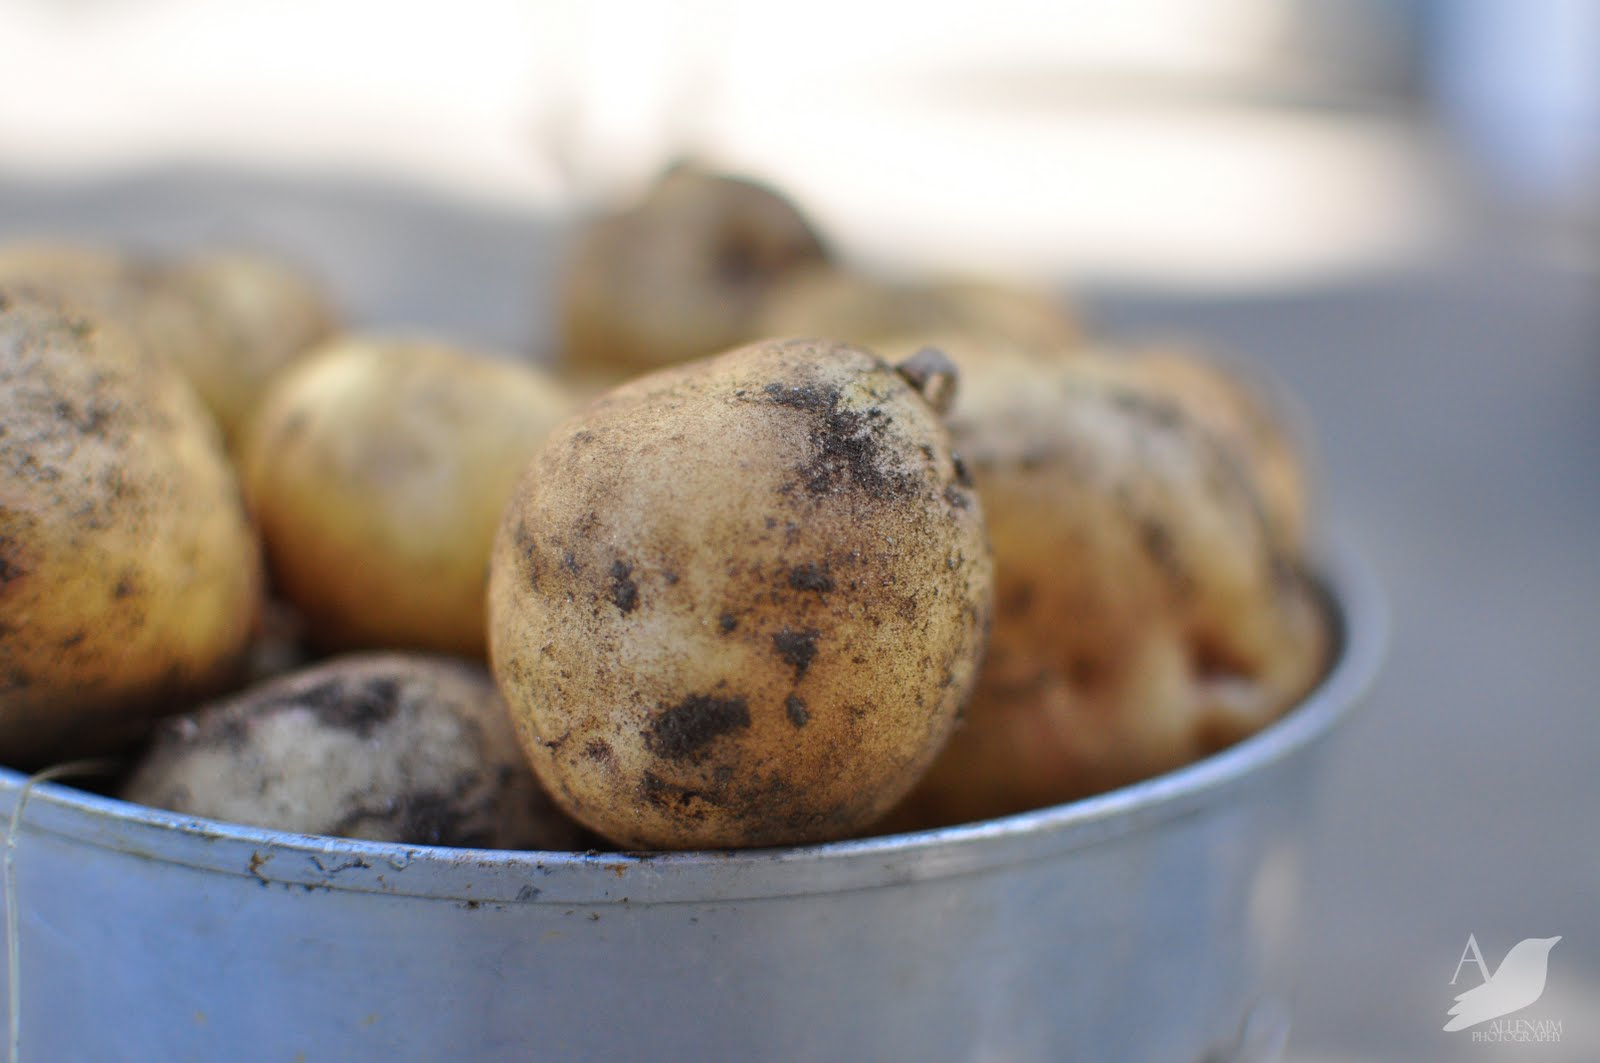 Buy Potato Grow Potato Eat Potato Plant Eat Potato Plant